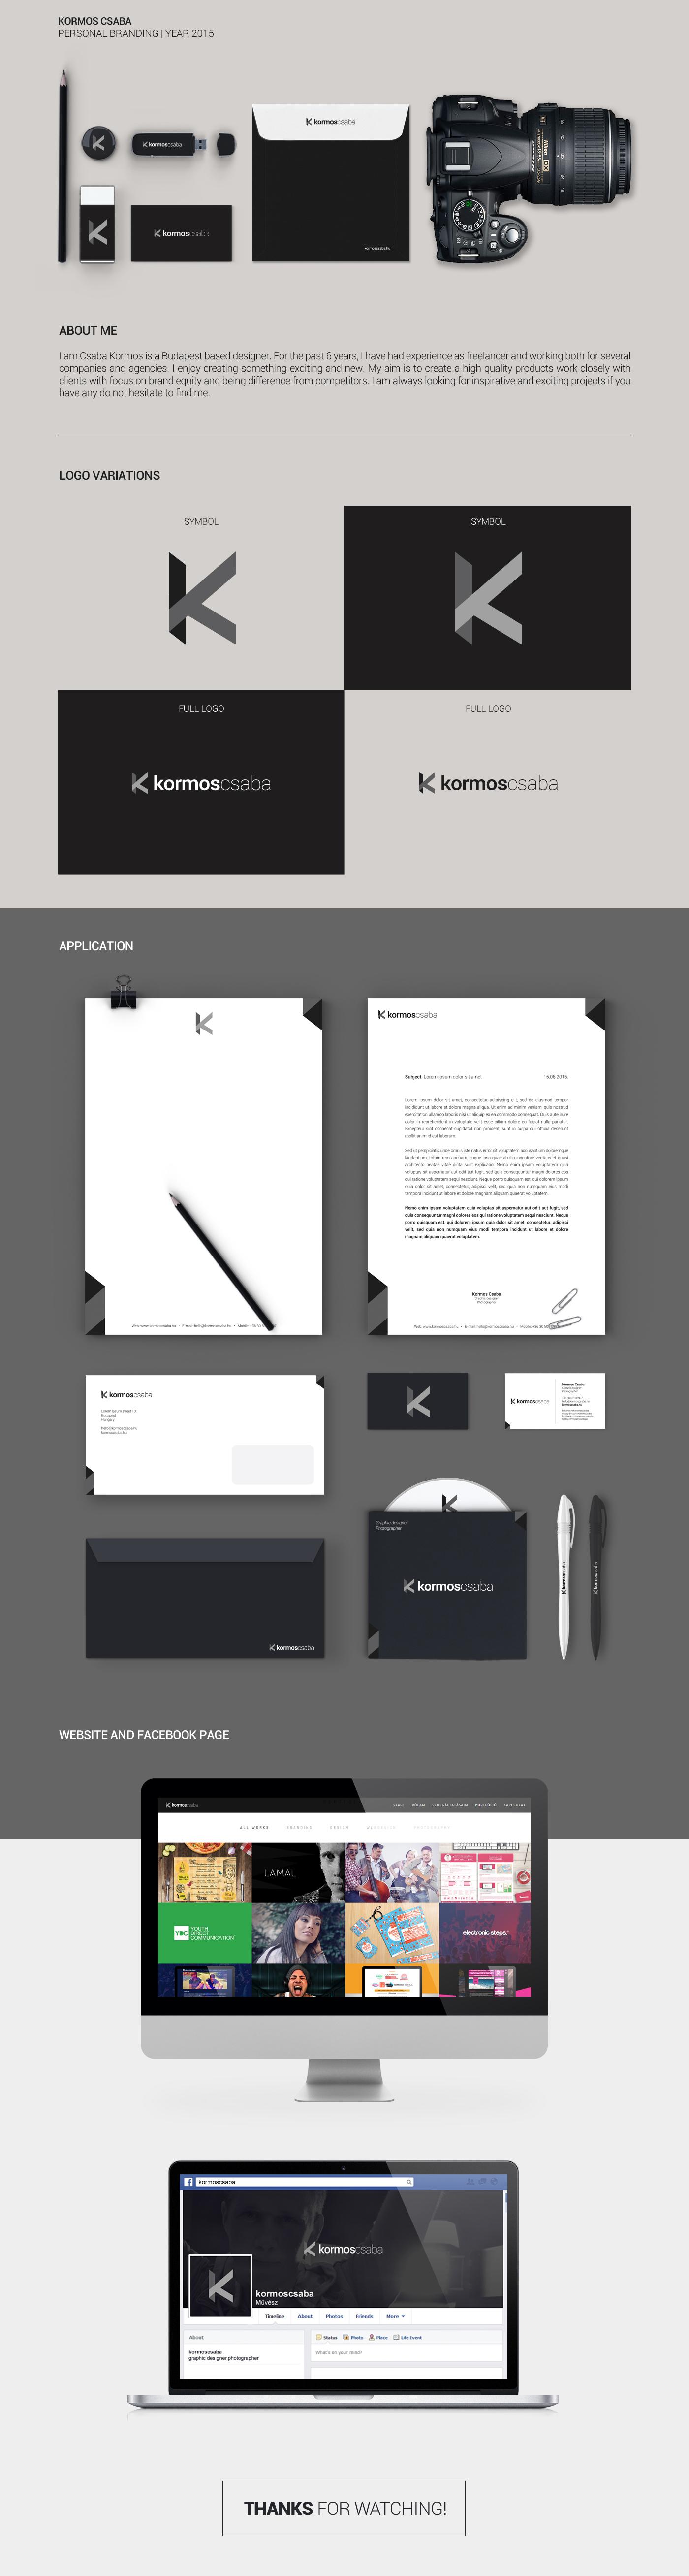 personal branding self self branding personal identity logo Webdesign facebook